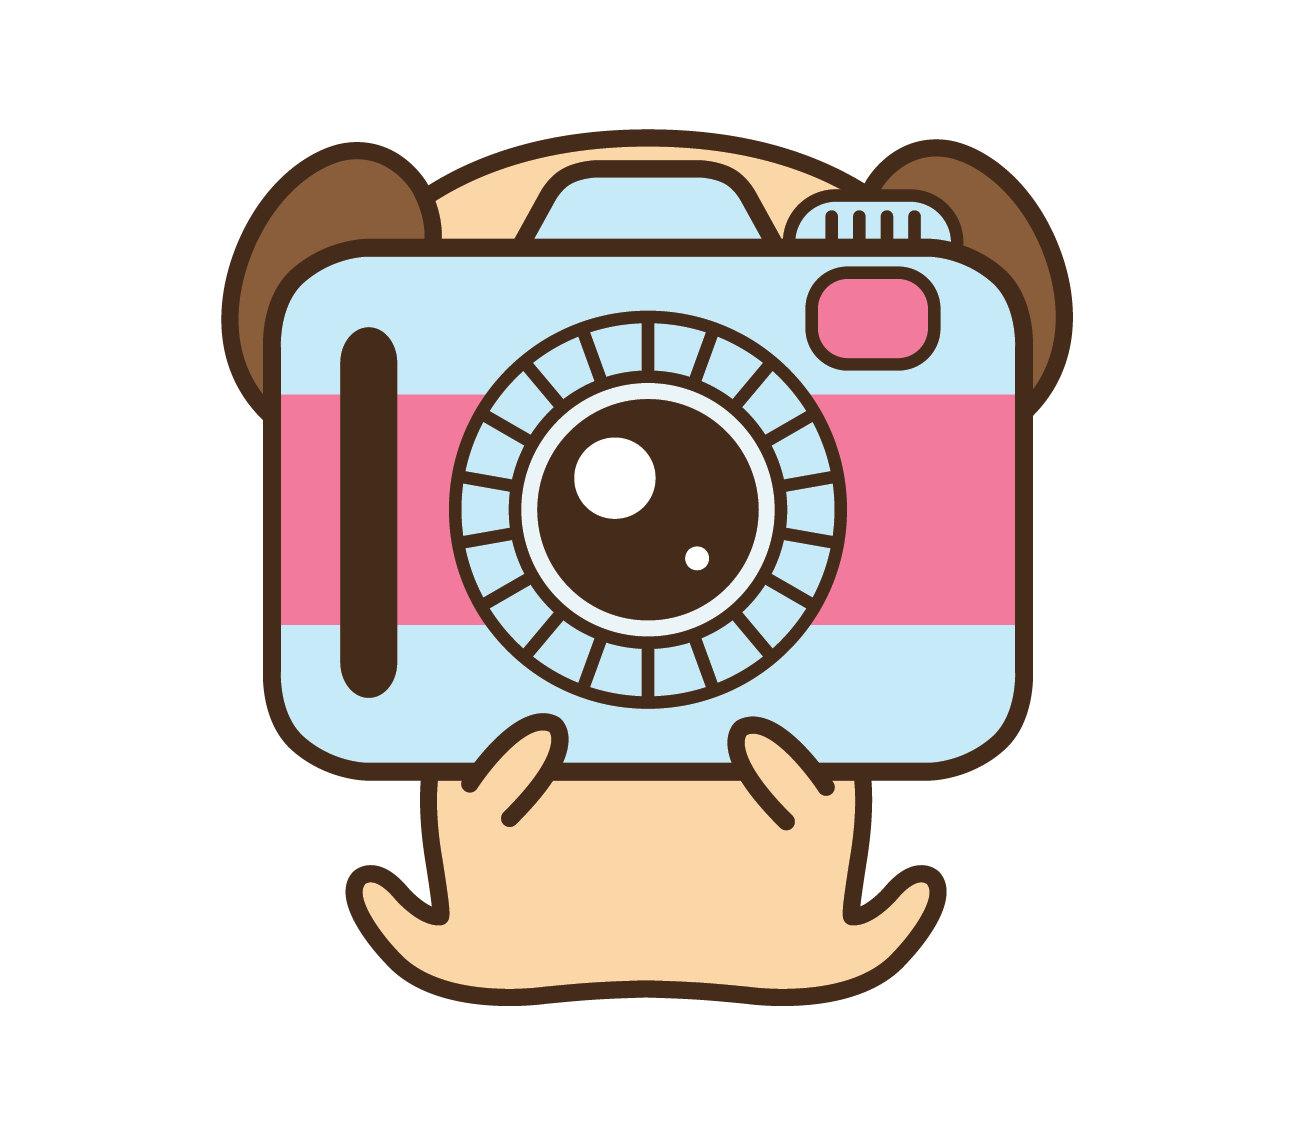 Camera clipart kawaii. Clip art pug hobby